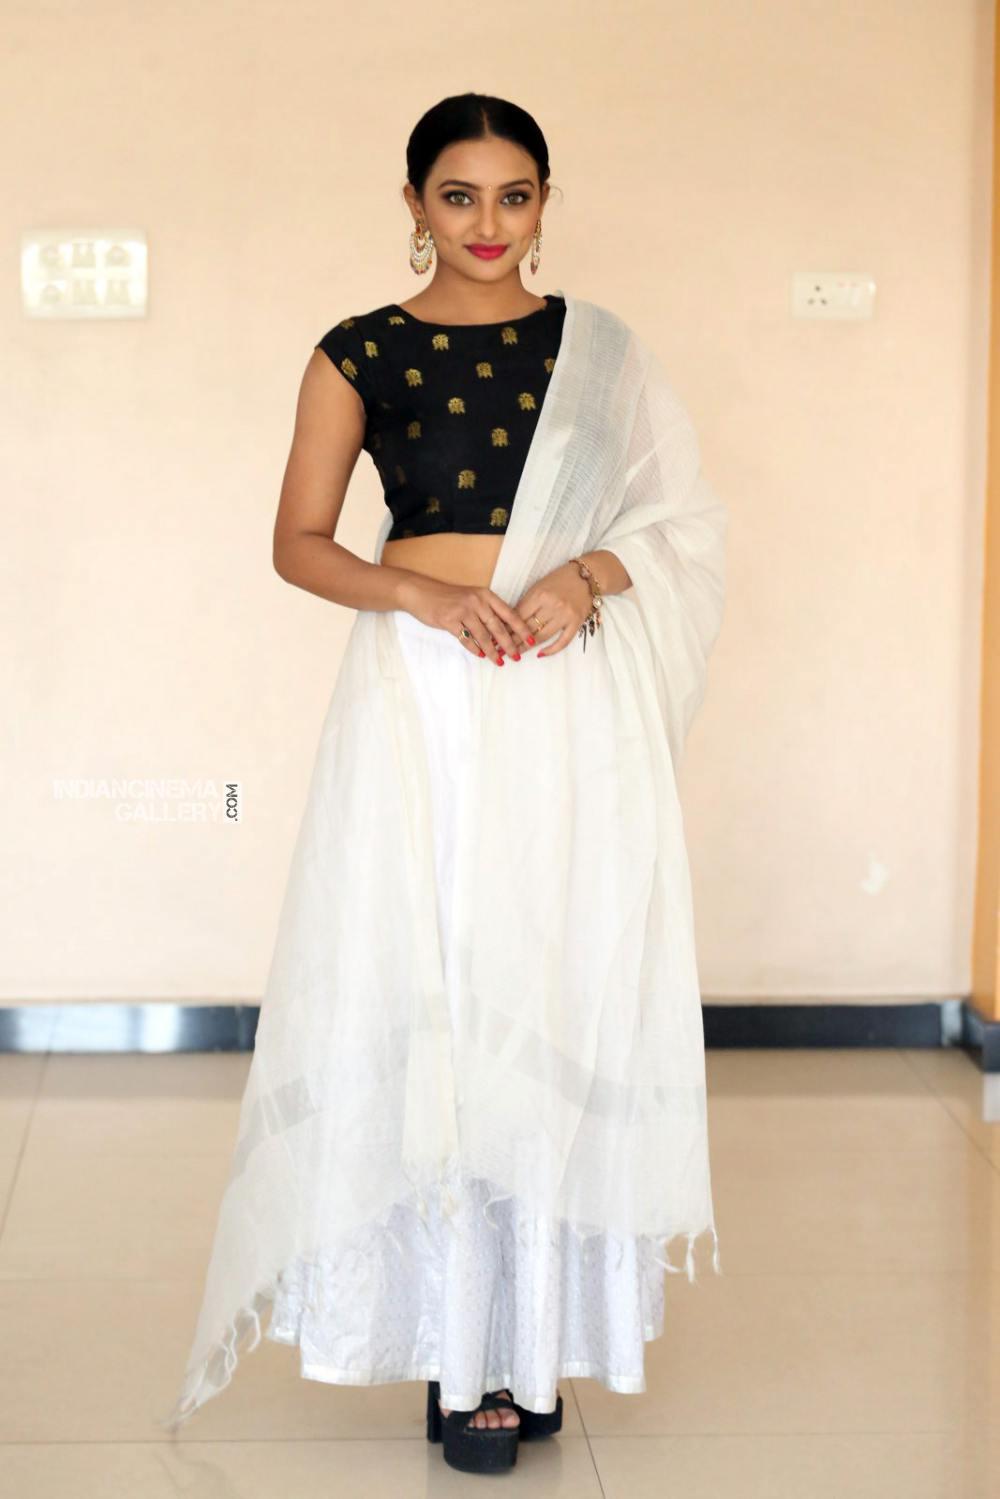 Actress Tuya Chakraborty Stills (1)